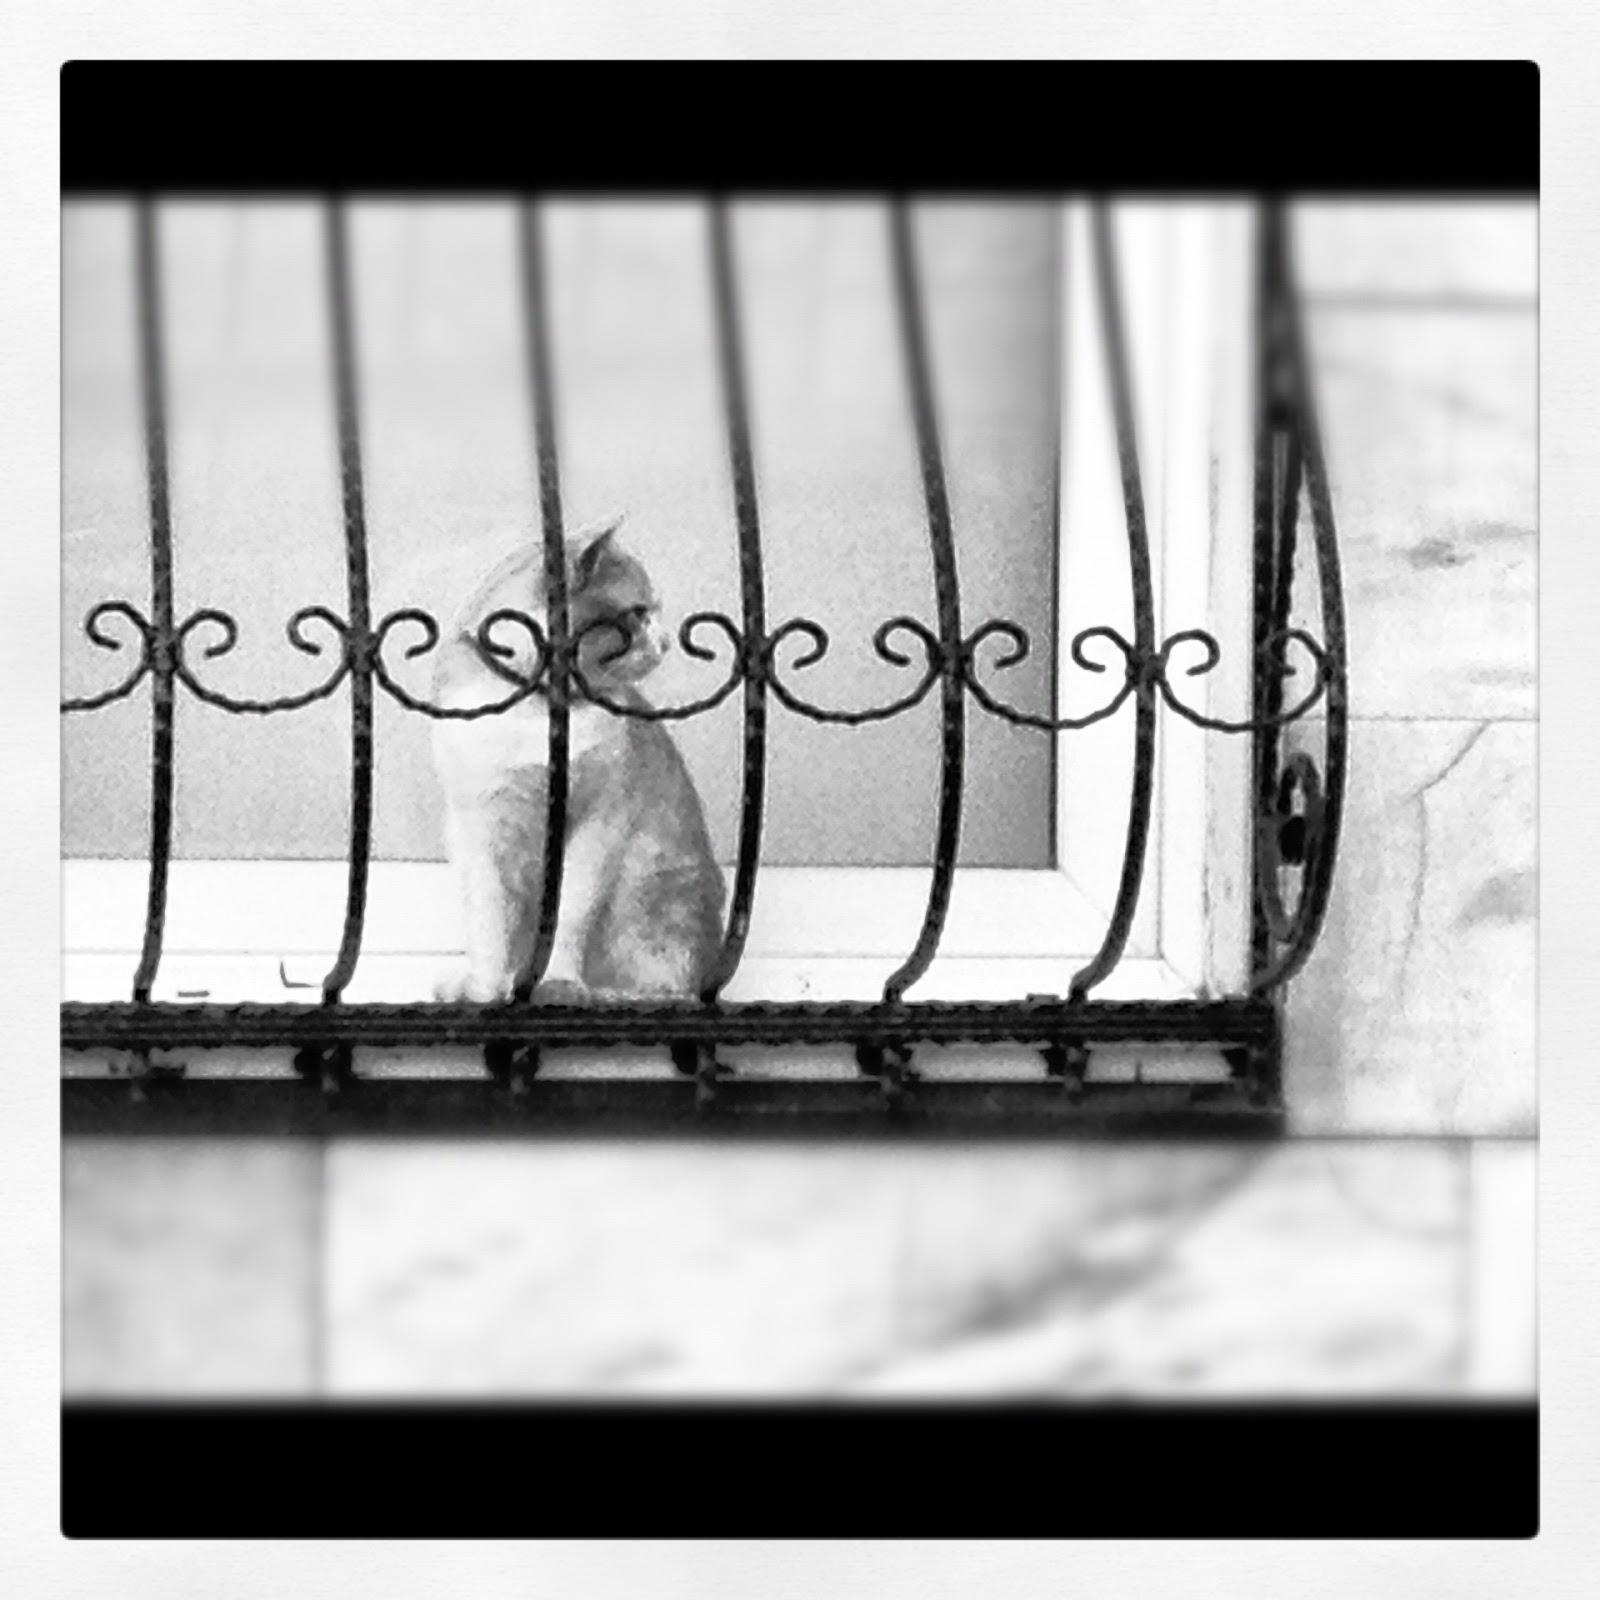 Istanbul Stray Cat in Window